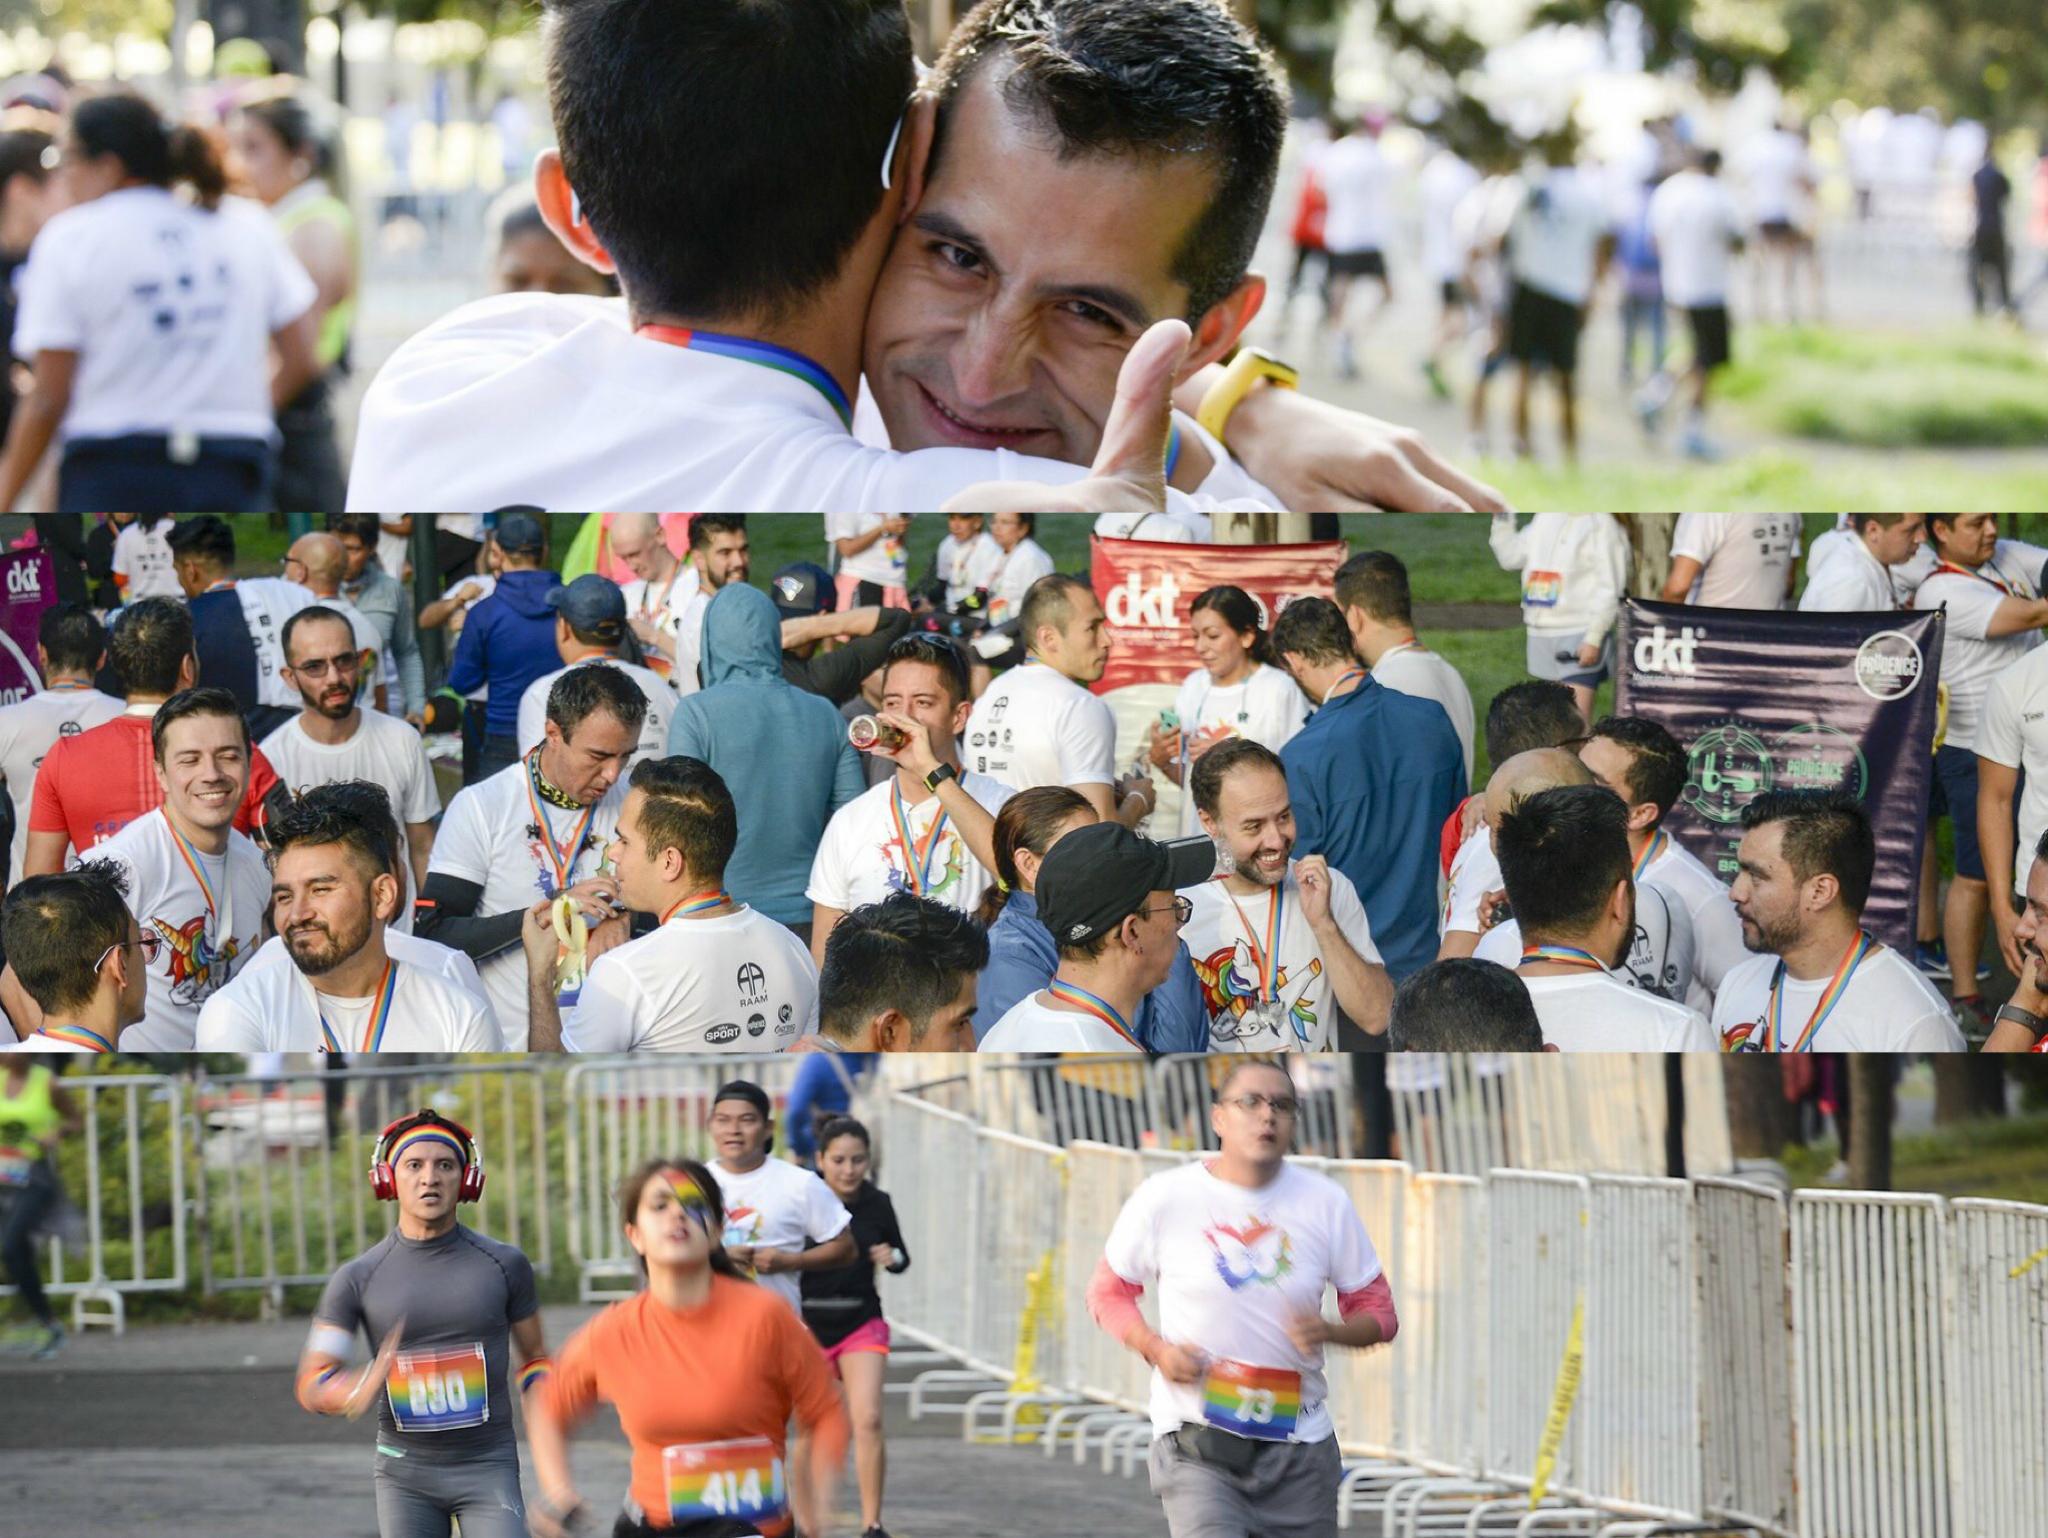 Pride Race LGBT+